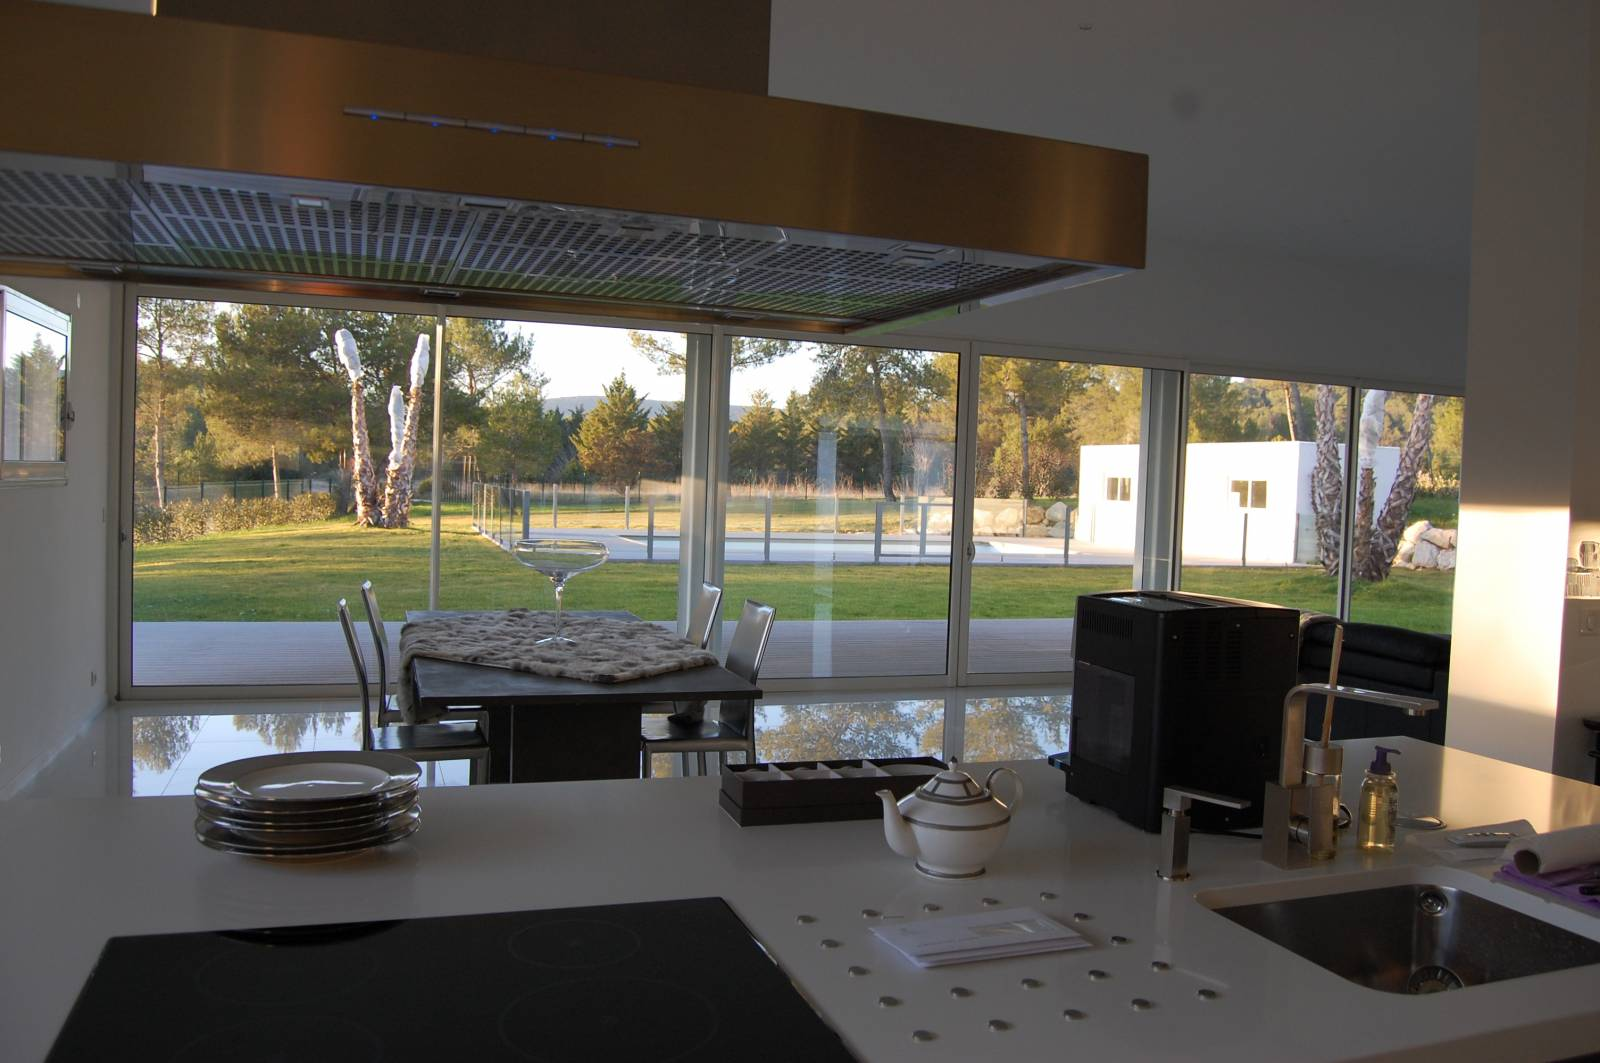 baie vitree 6 metres prix maison design. Black Bedroom Furniture Sets. Home Design Ideas